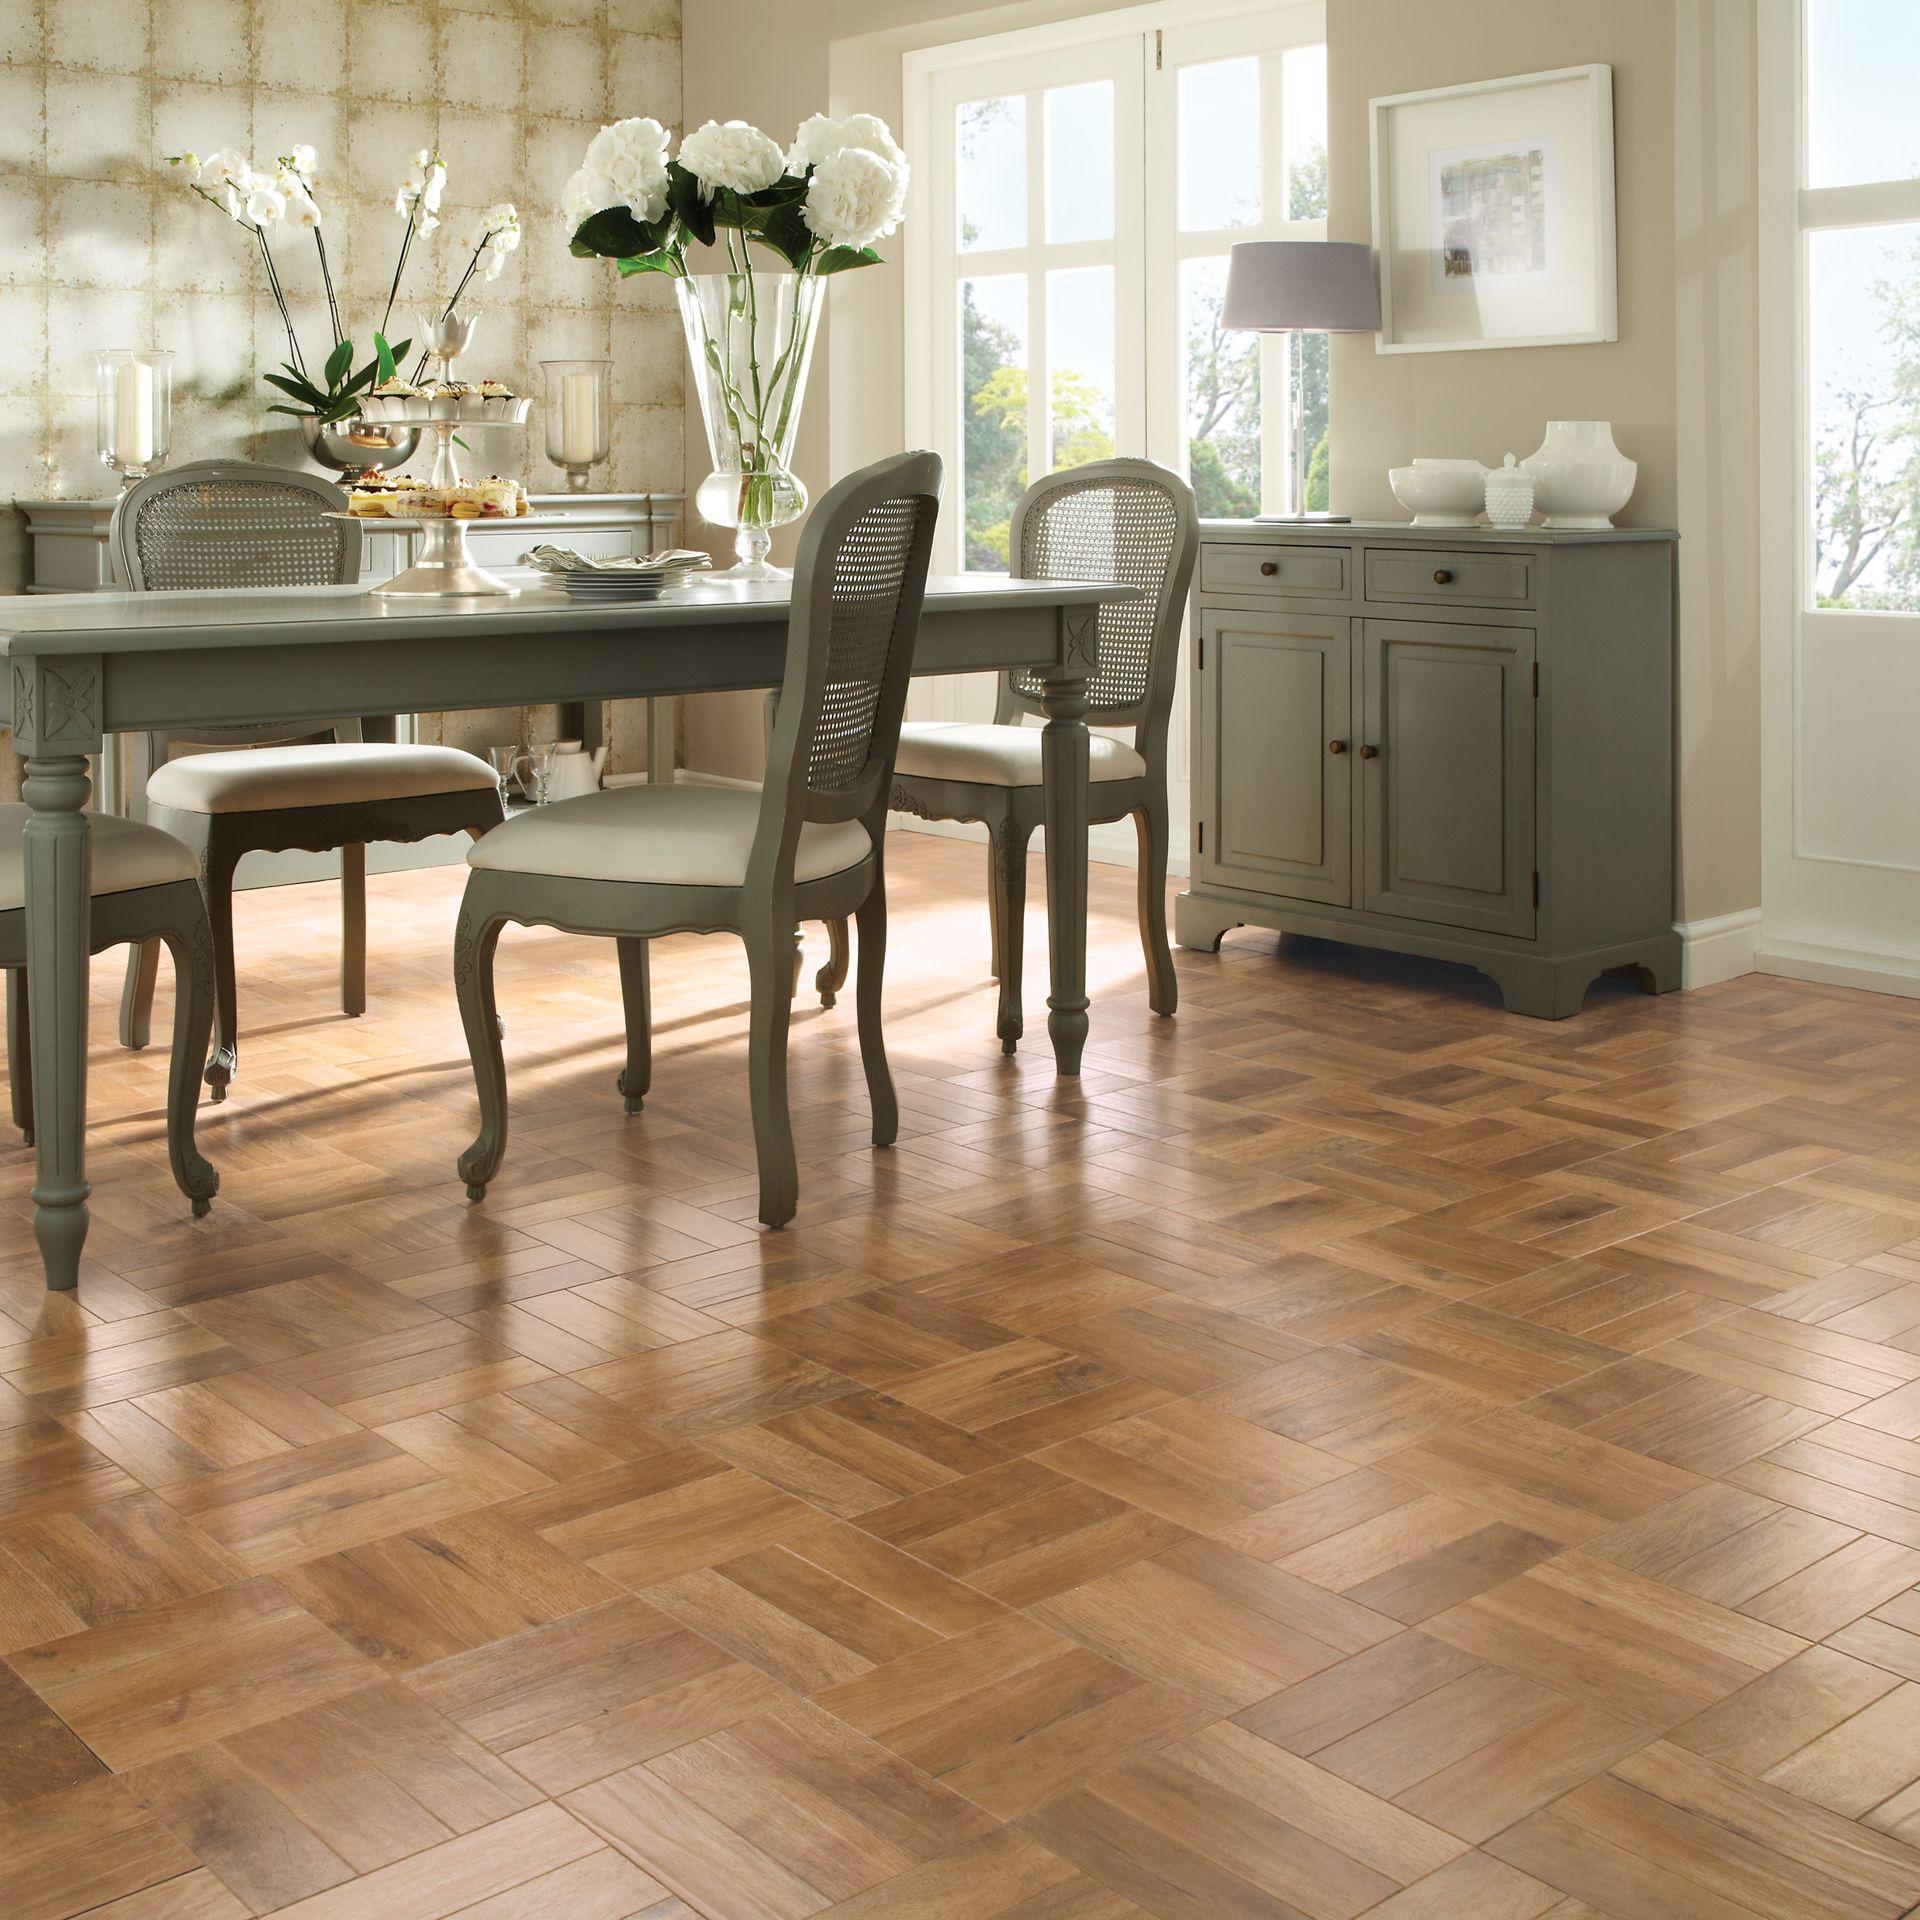 floors max oak laminate premier blonde onyx flooring home pin pergo hardwood